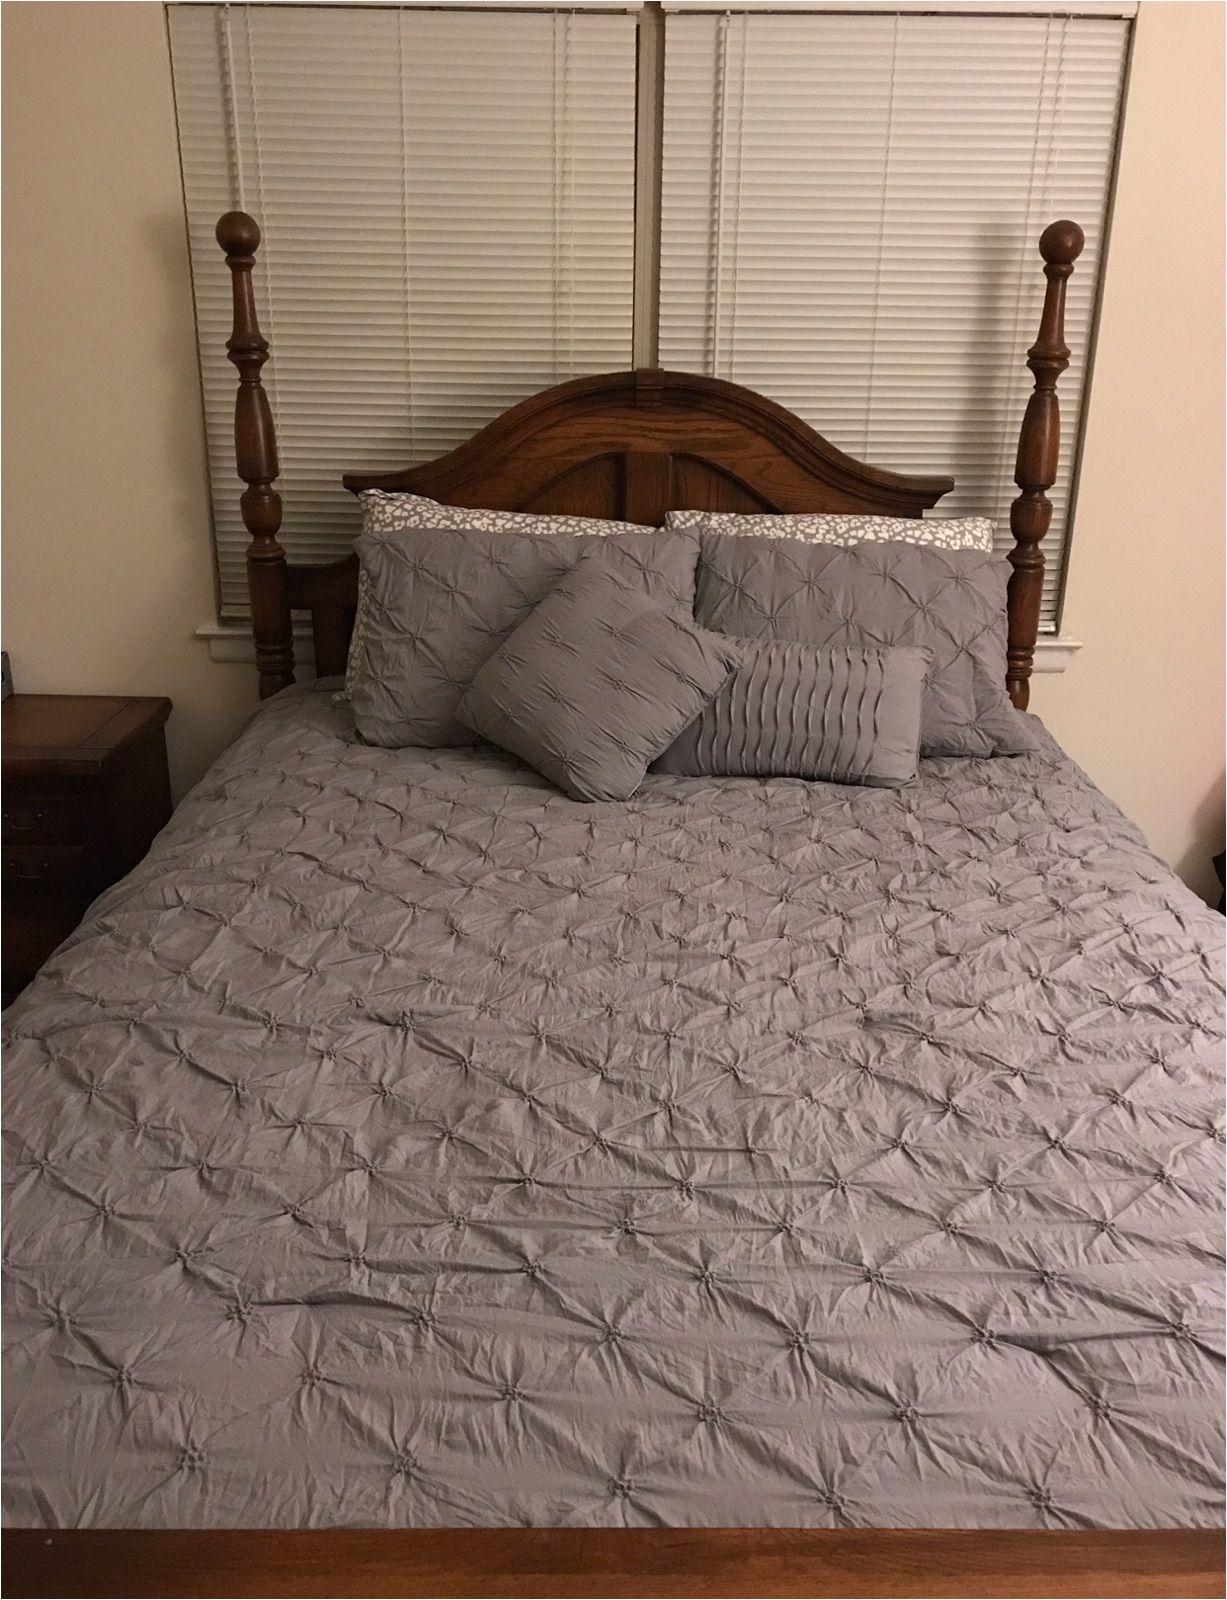 Lush Decor Belle 4 Piece Comforter Set Ravello Pintuck 5 Piece Comforter Set Pinterest Comforter